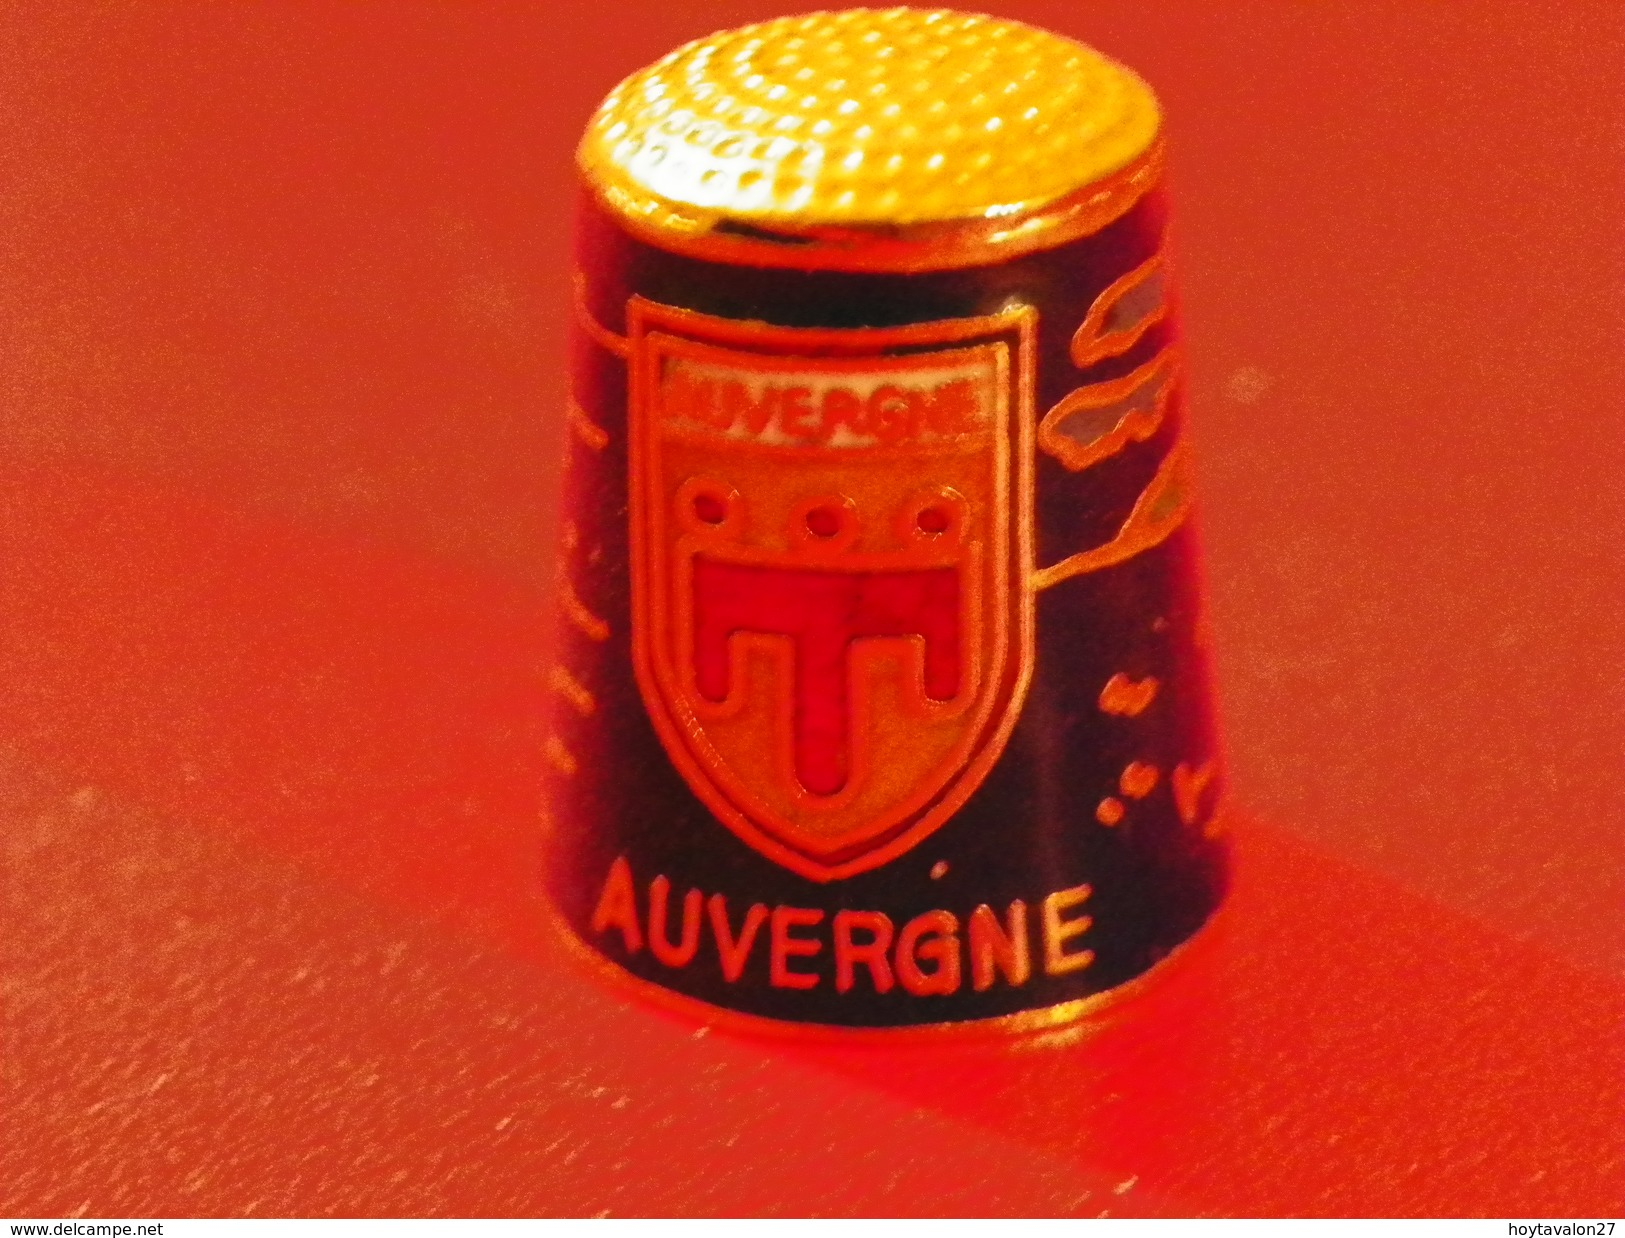 "Dé Cloisoné""Auvergne"" - Ditali Da Cucito"